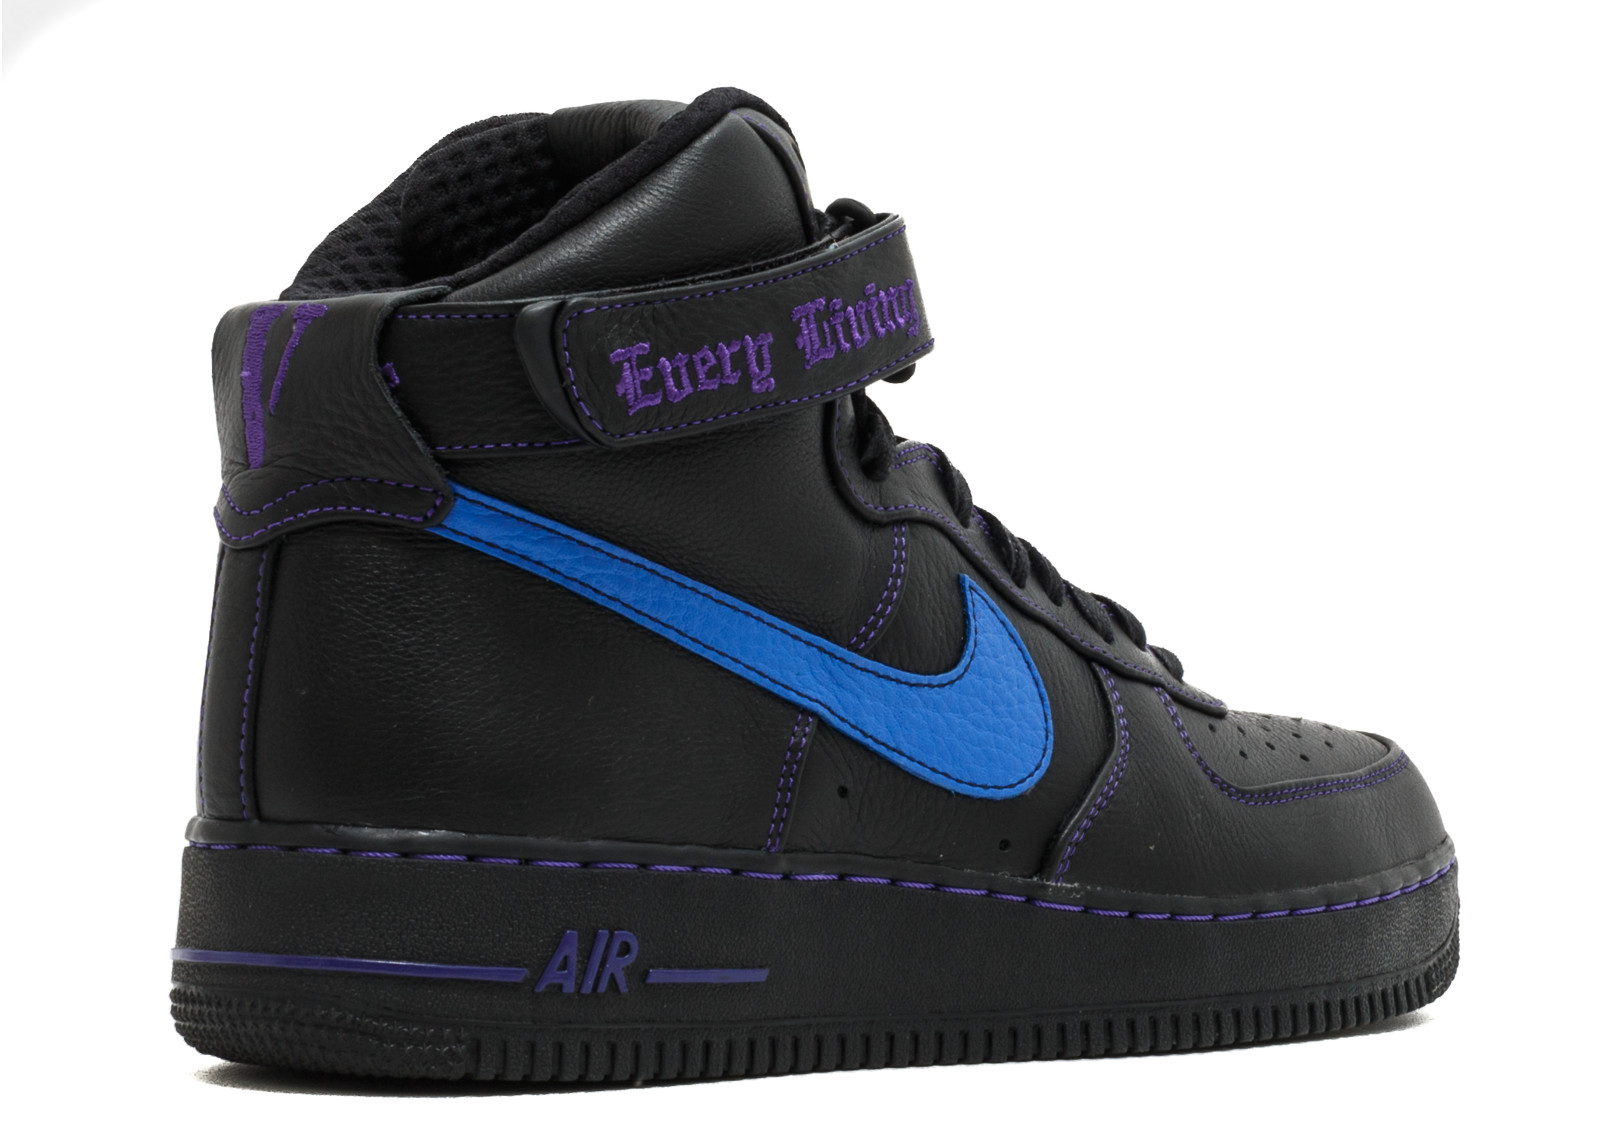 bcb5034fd35 ... Air Force 1 High Vlone Blue Court Purple Black Prize 778911-906813 ...